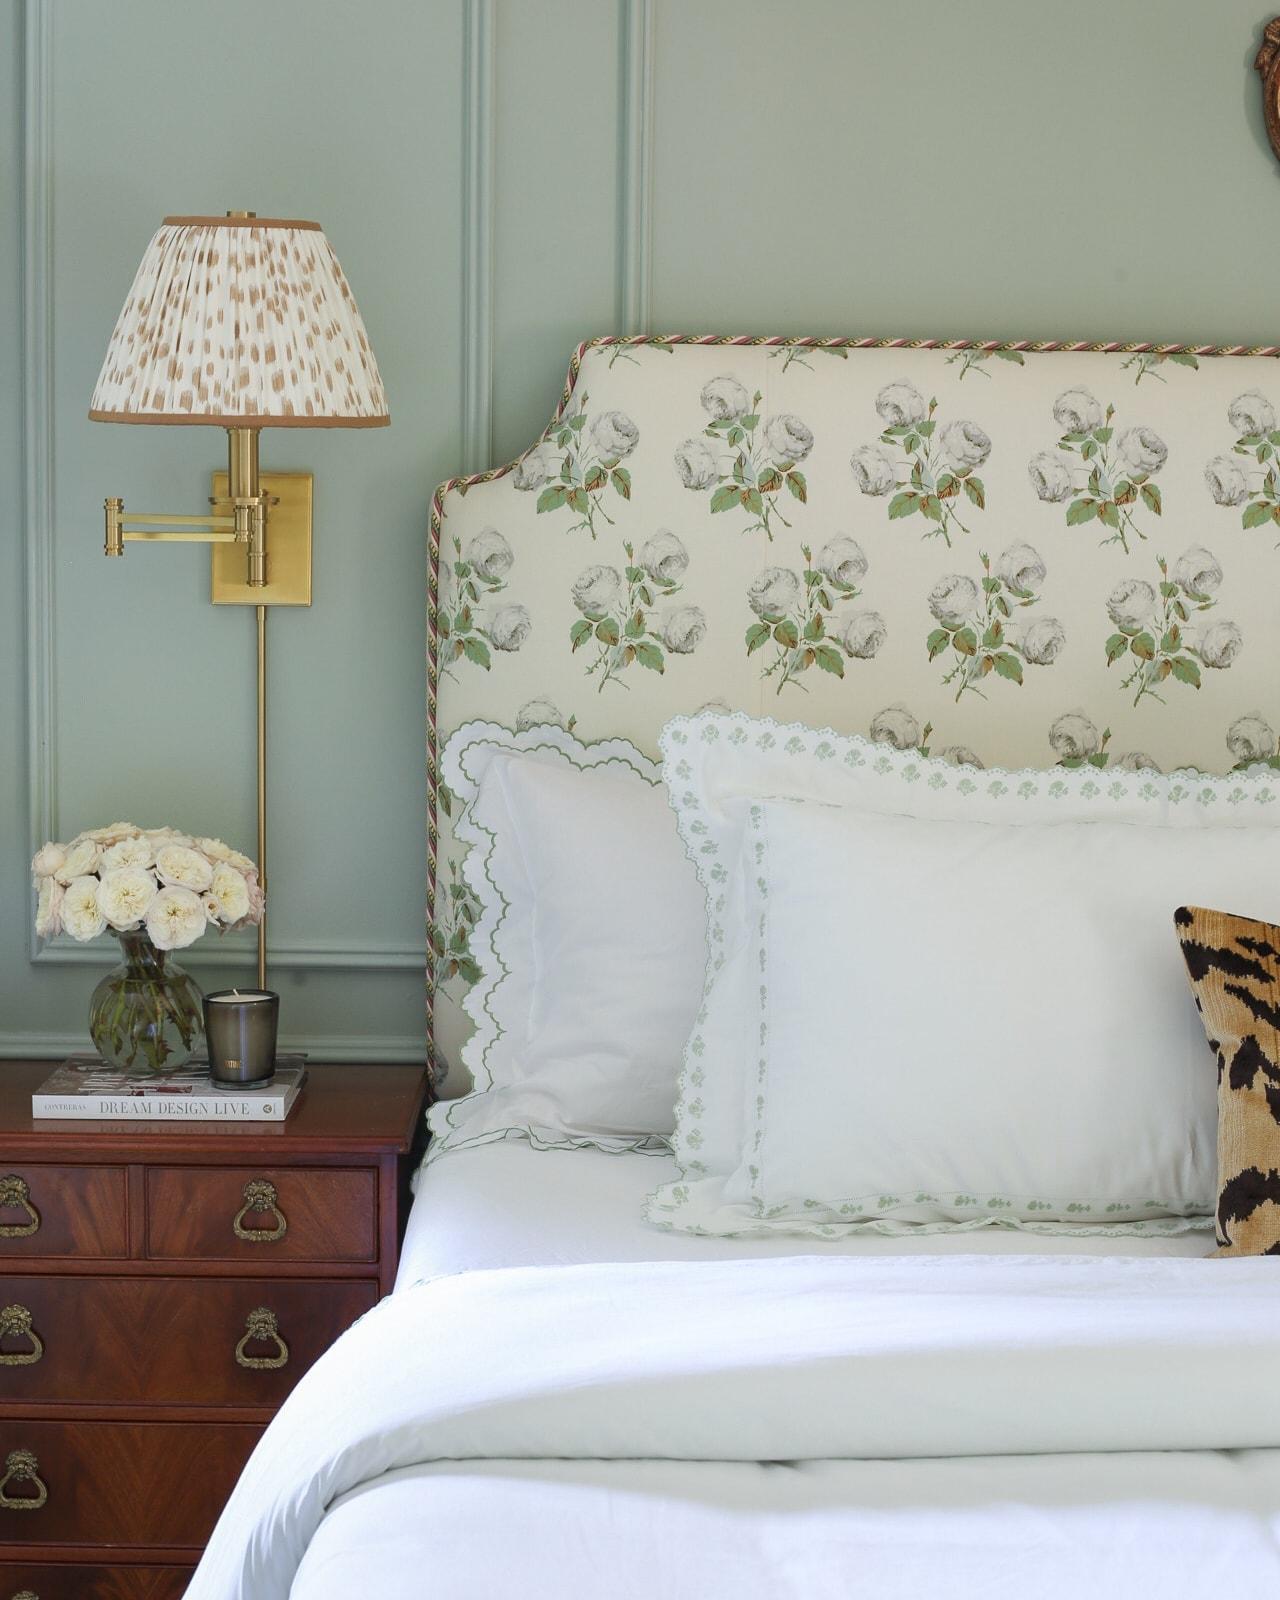 bowood-bedroom-inspiration-ideas